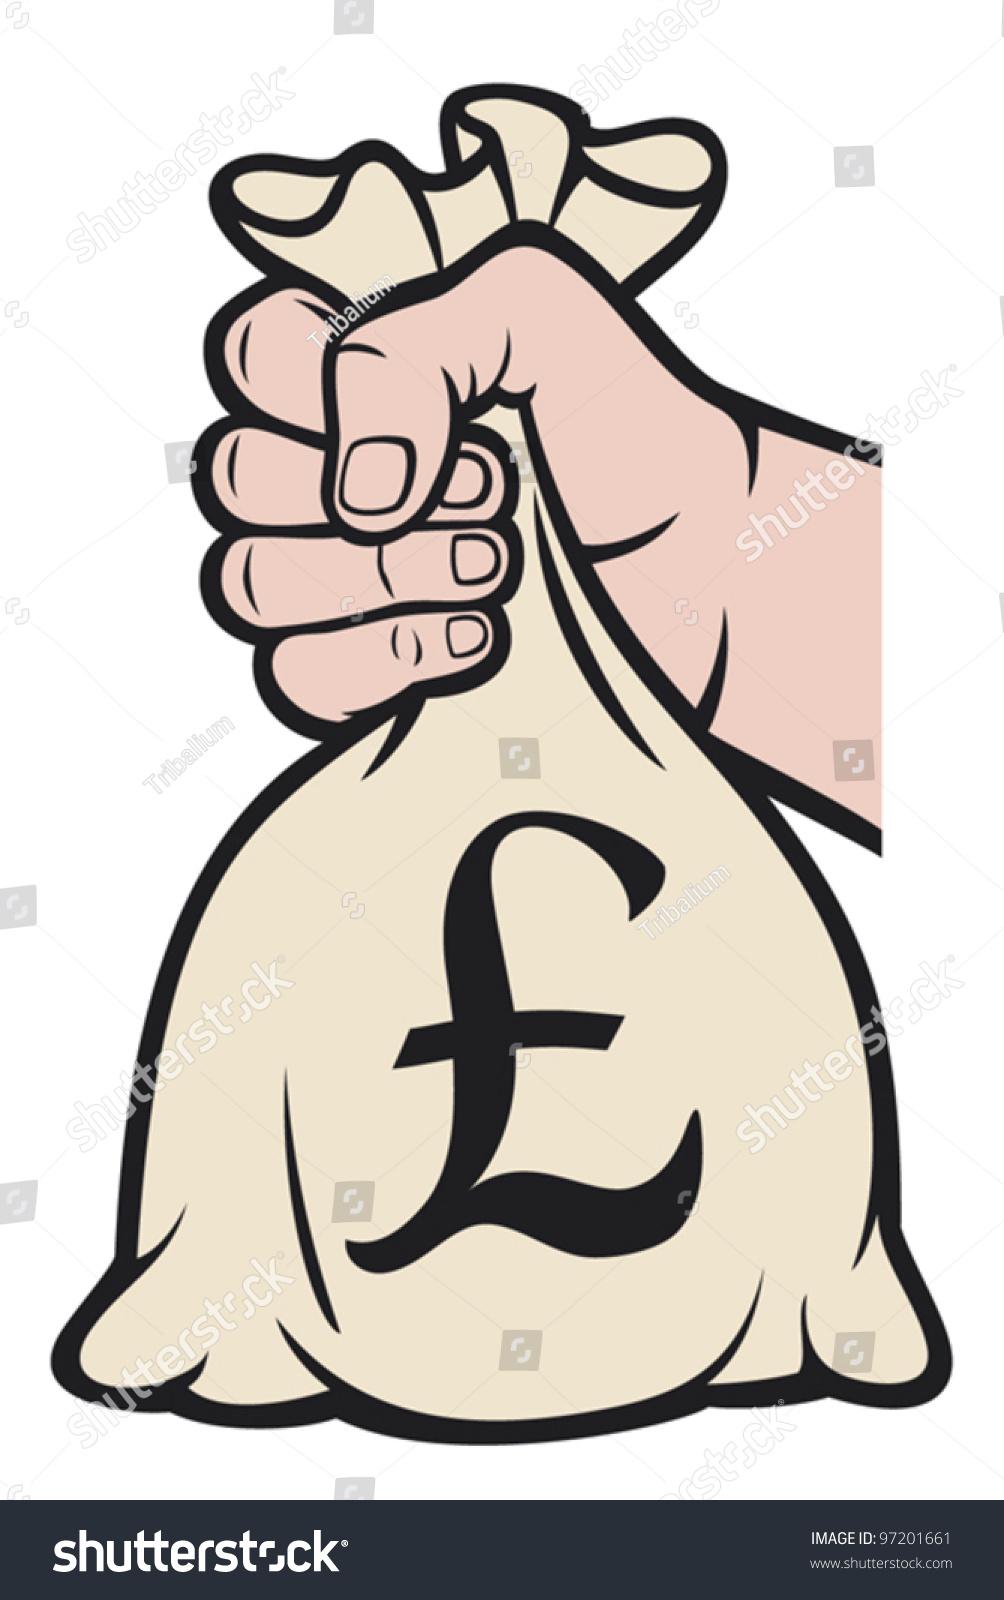 Hand holding money bag pound sign stock vector 97201661 shutterstock hand holding money bag with pound sign buycottarizona Images